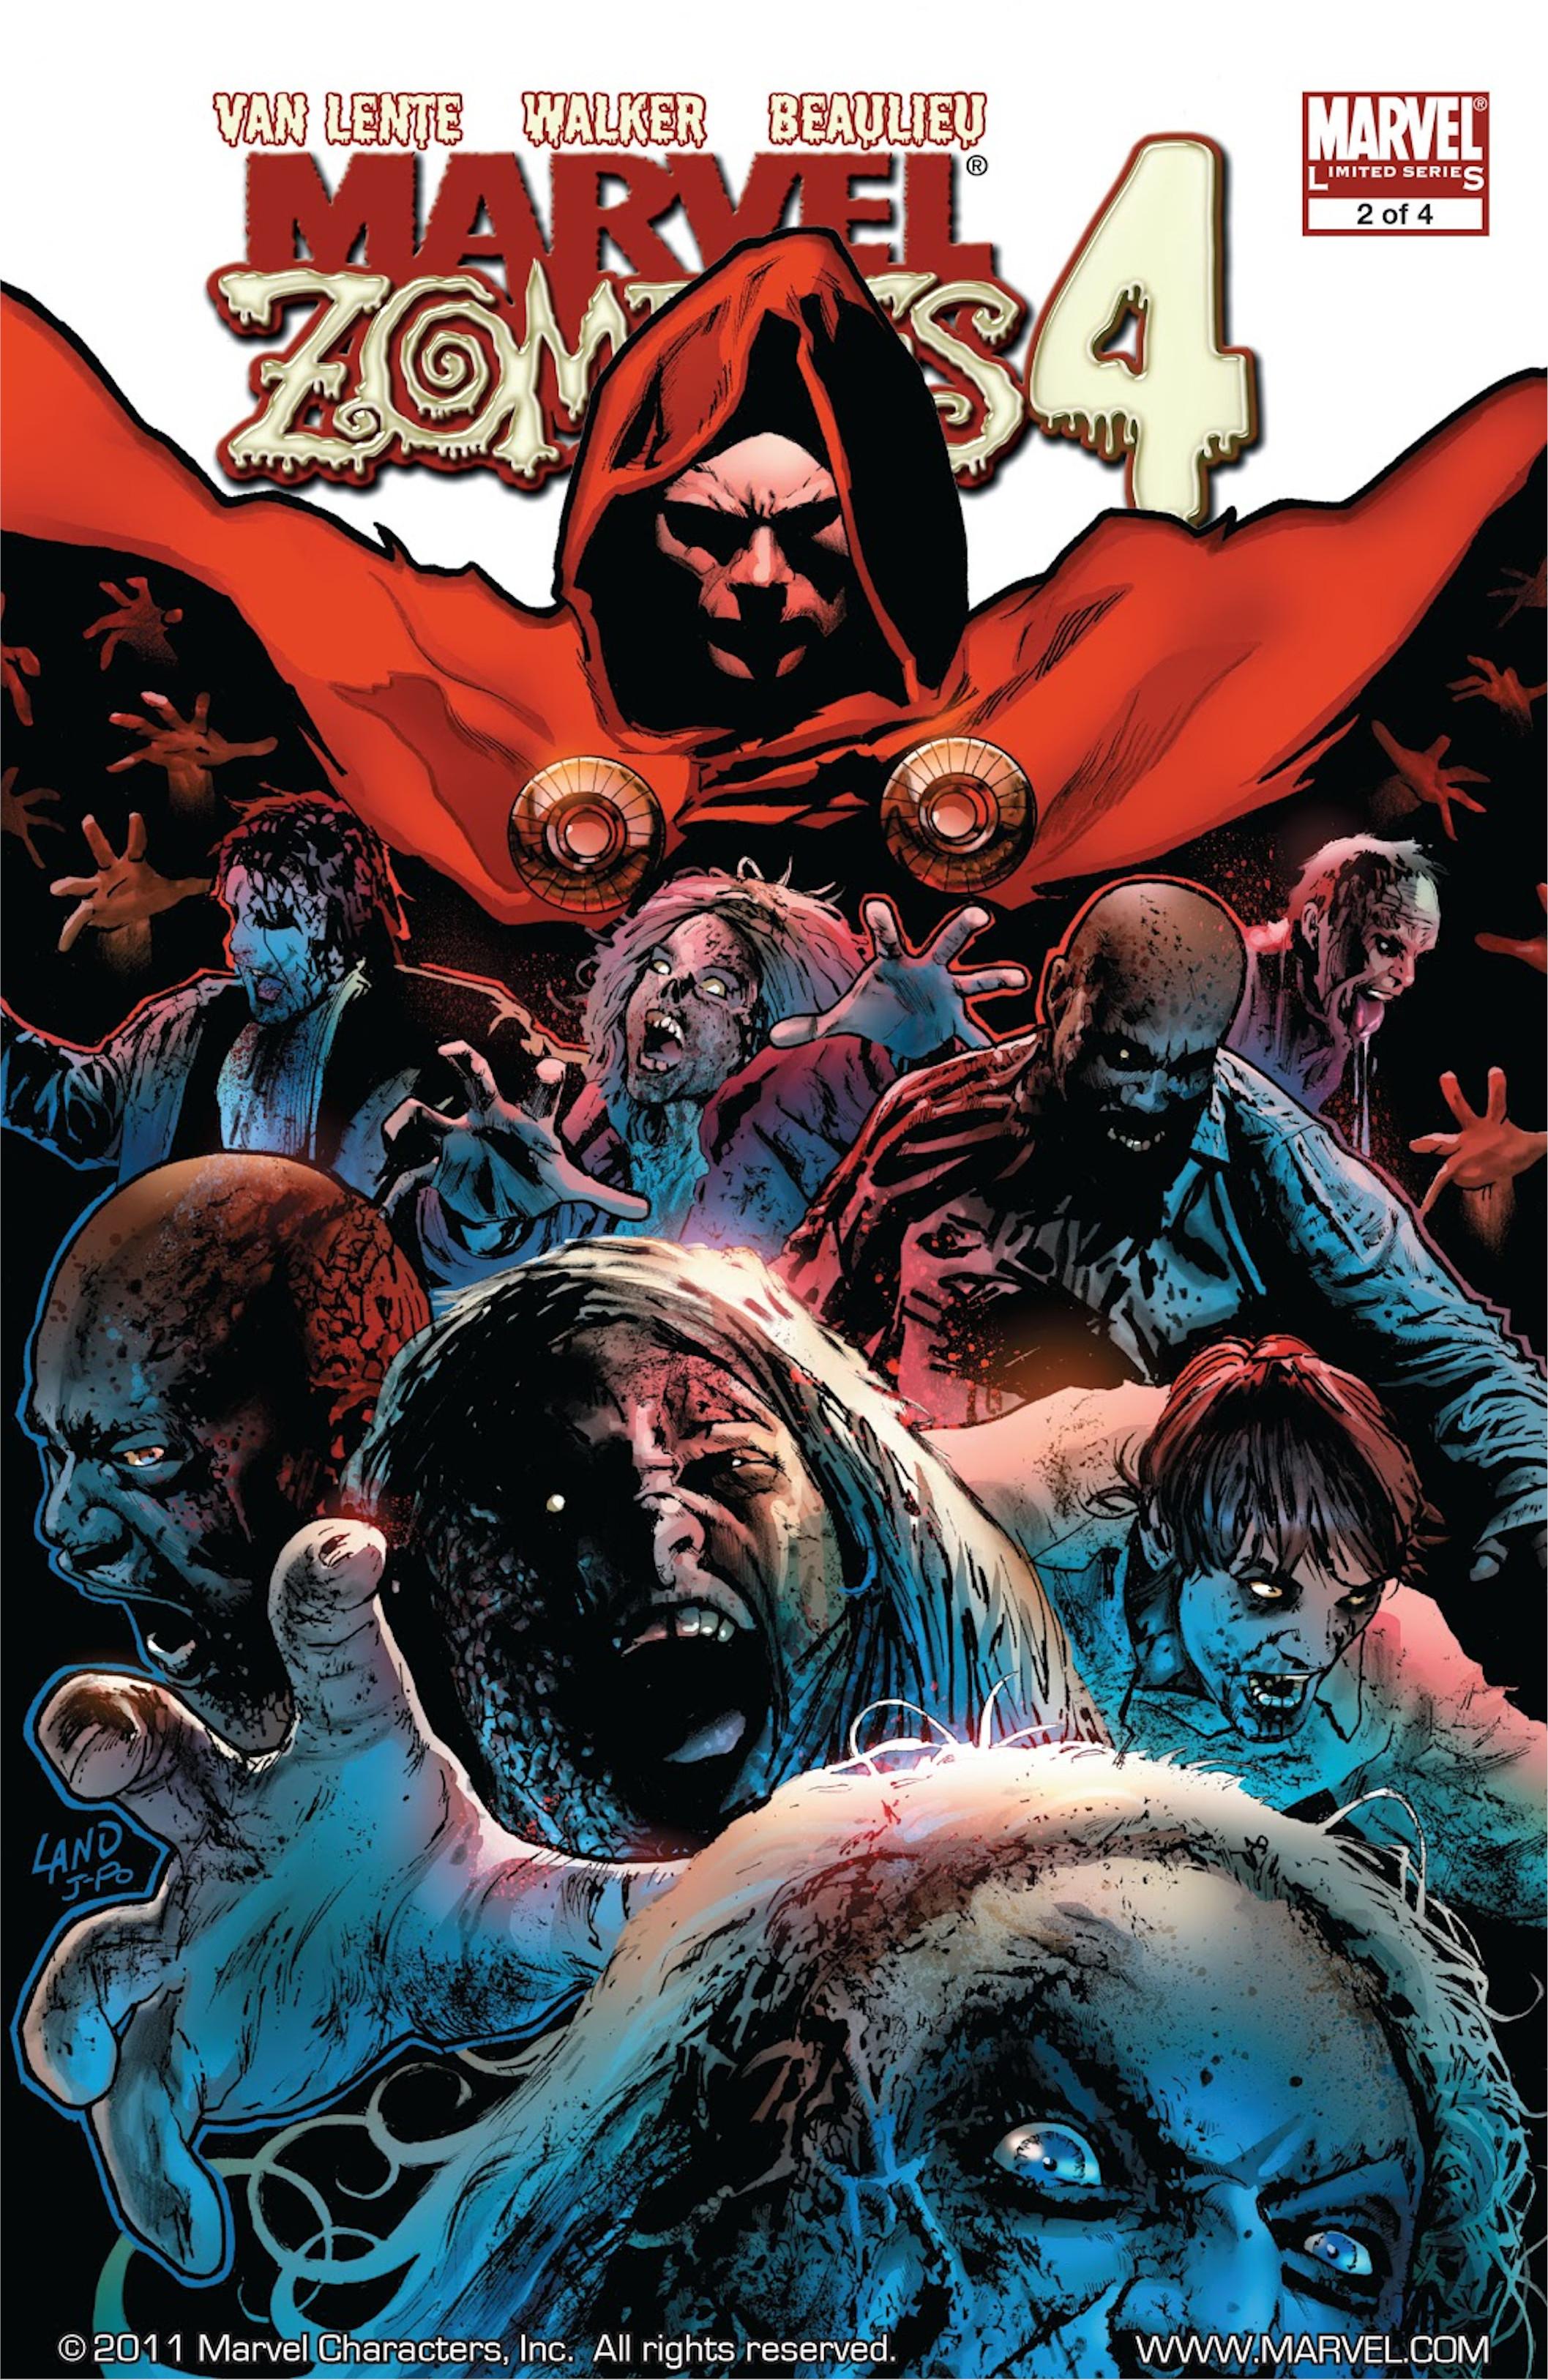 Marvel Zombies 4 Vol 1 2 - Marvel Database - FANDOM powered by Wikia Marvel Zombies 4 Vol 1 2 - 웹